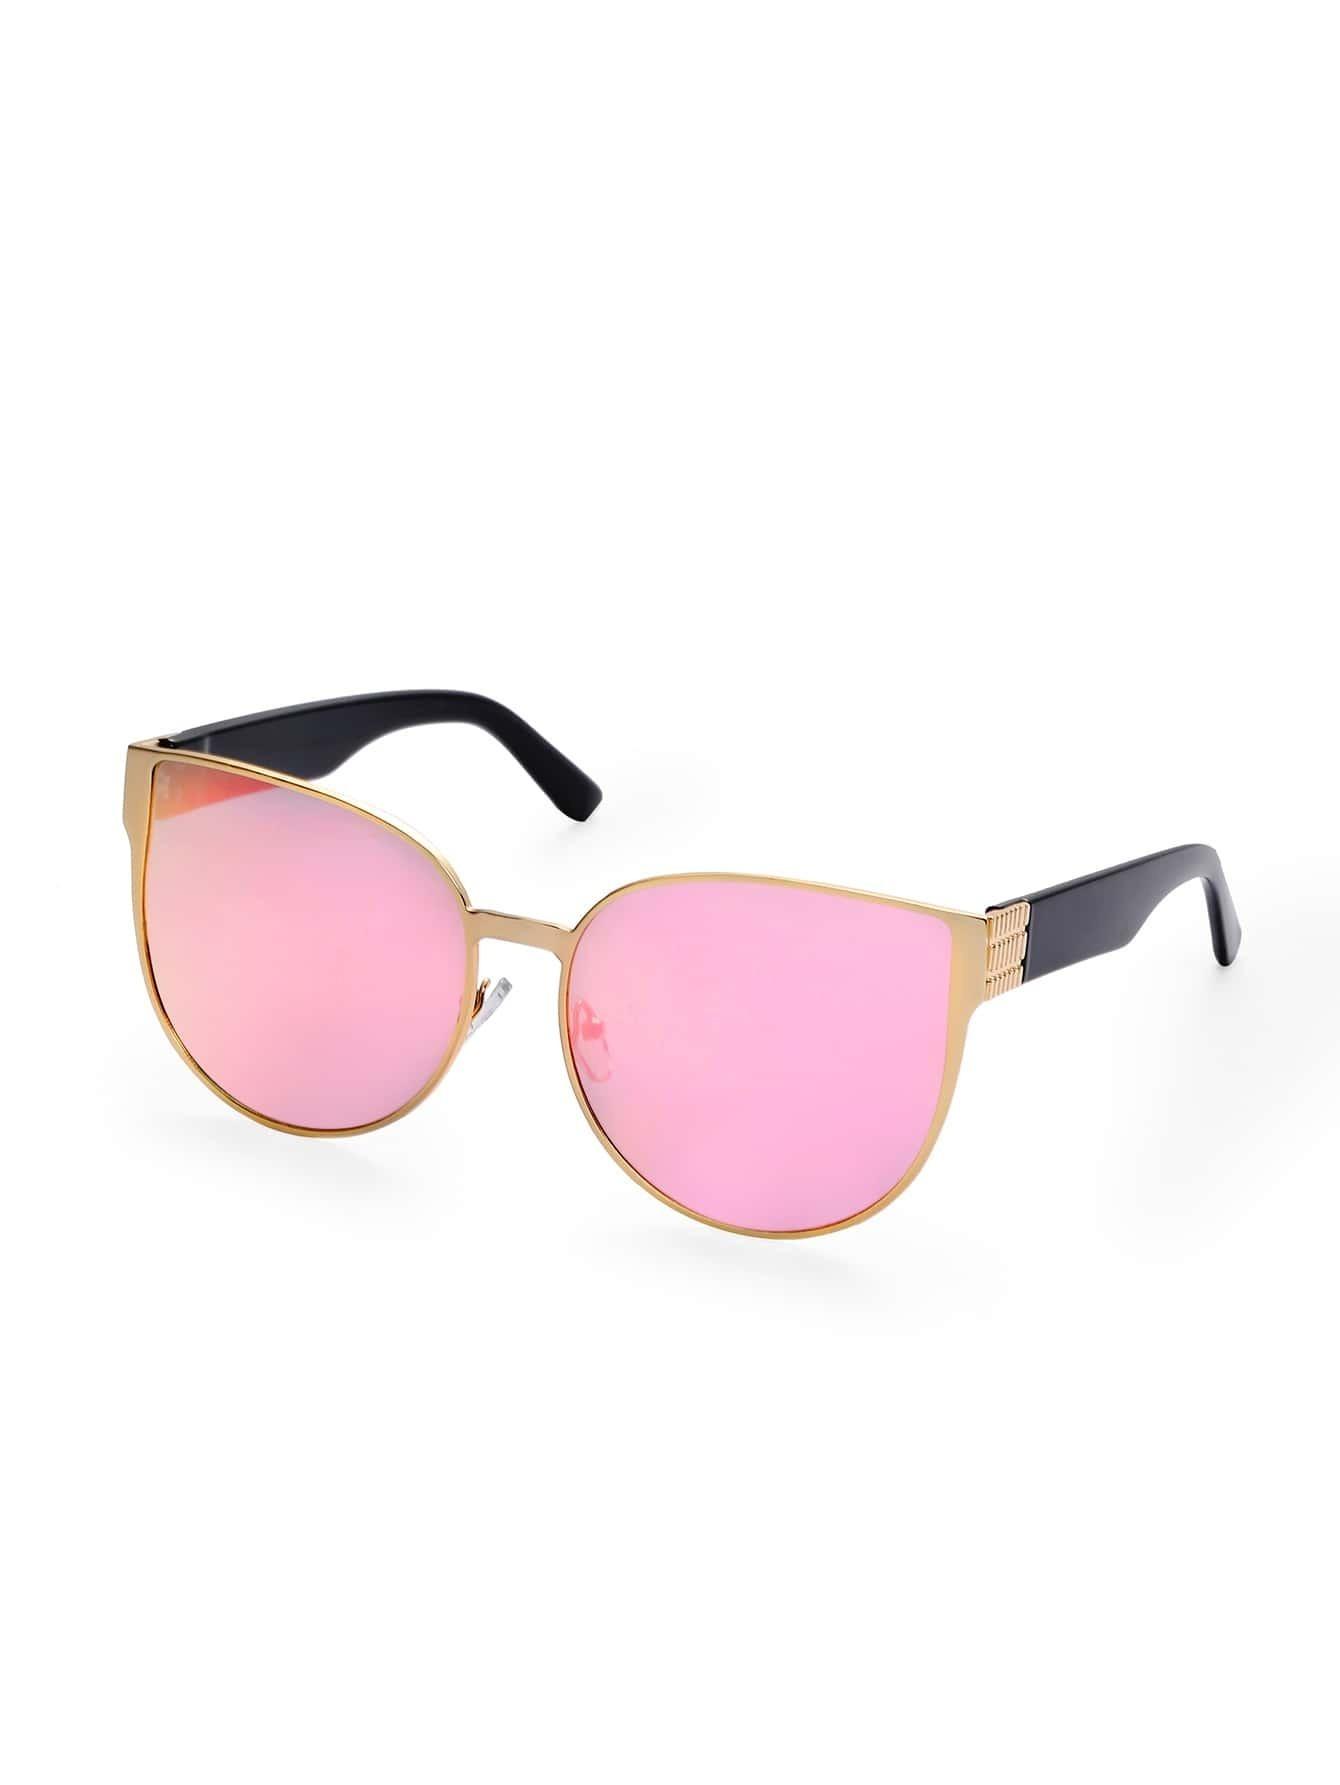 Gold Frame Cat Eye Sunglasses : Gold Metal Frame Pink Vintage Cat Eye Sunglasses